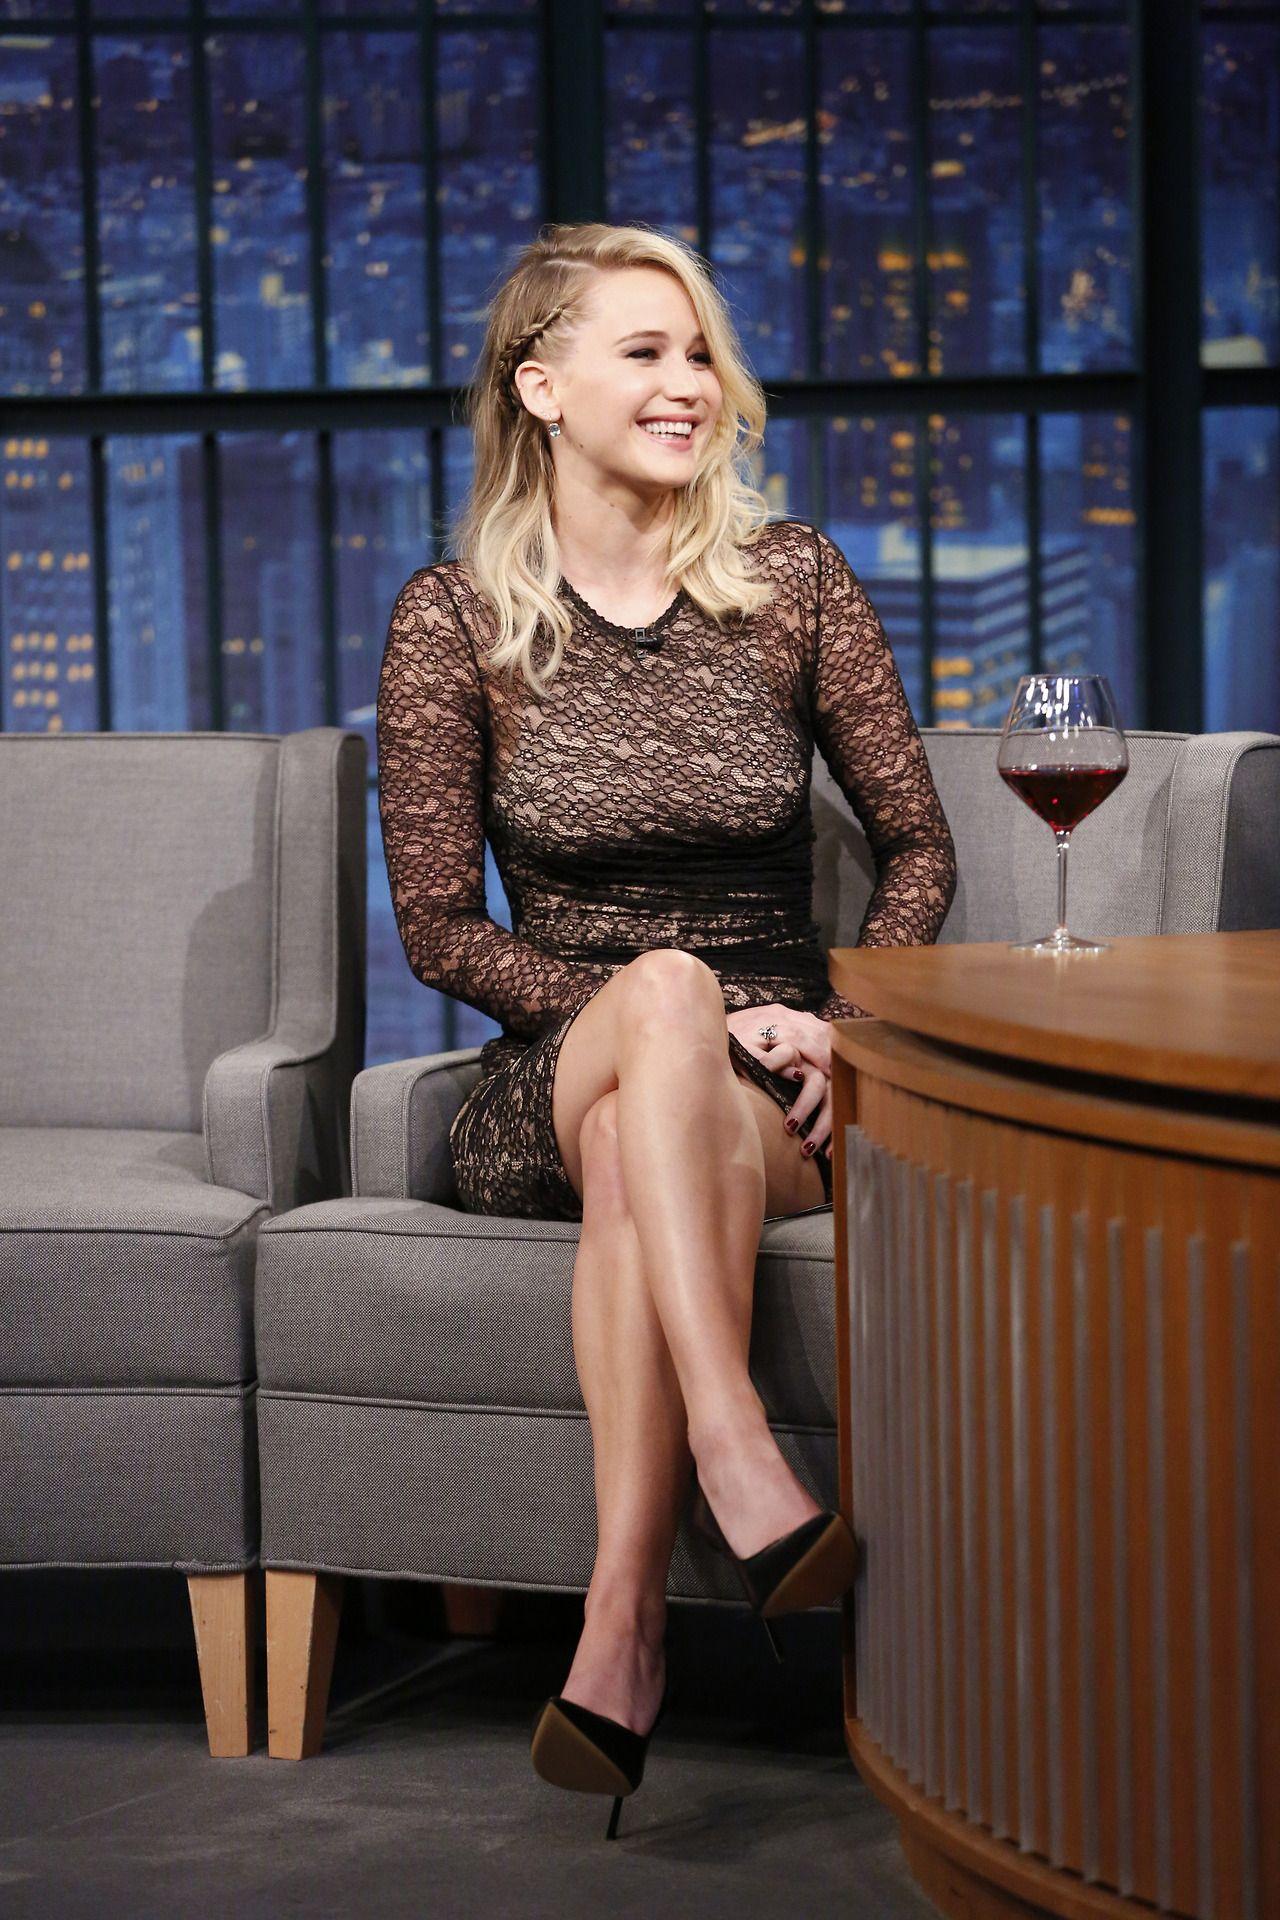 18 Nicky Hilton,Amber flowers topless Sex videos Gwen stefani sexy 57 Photos,Hanna alstrom sexy